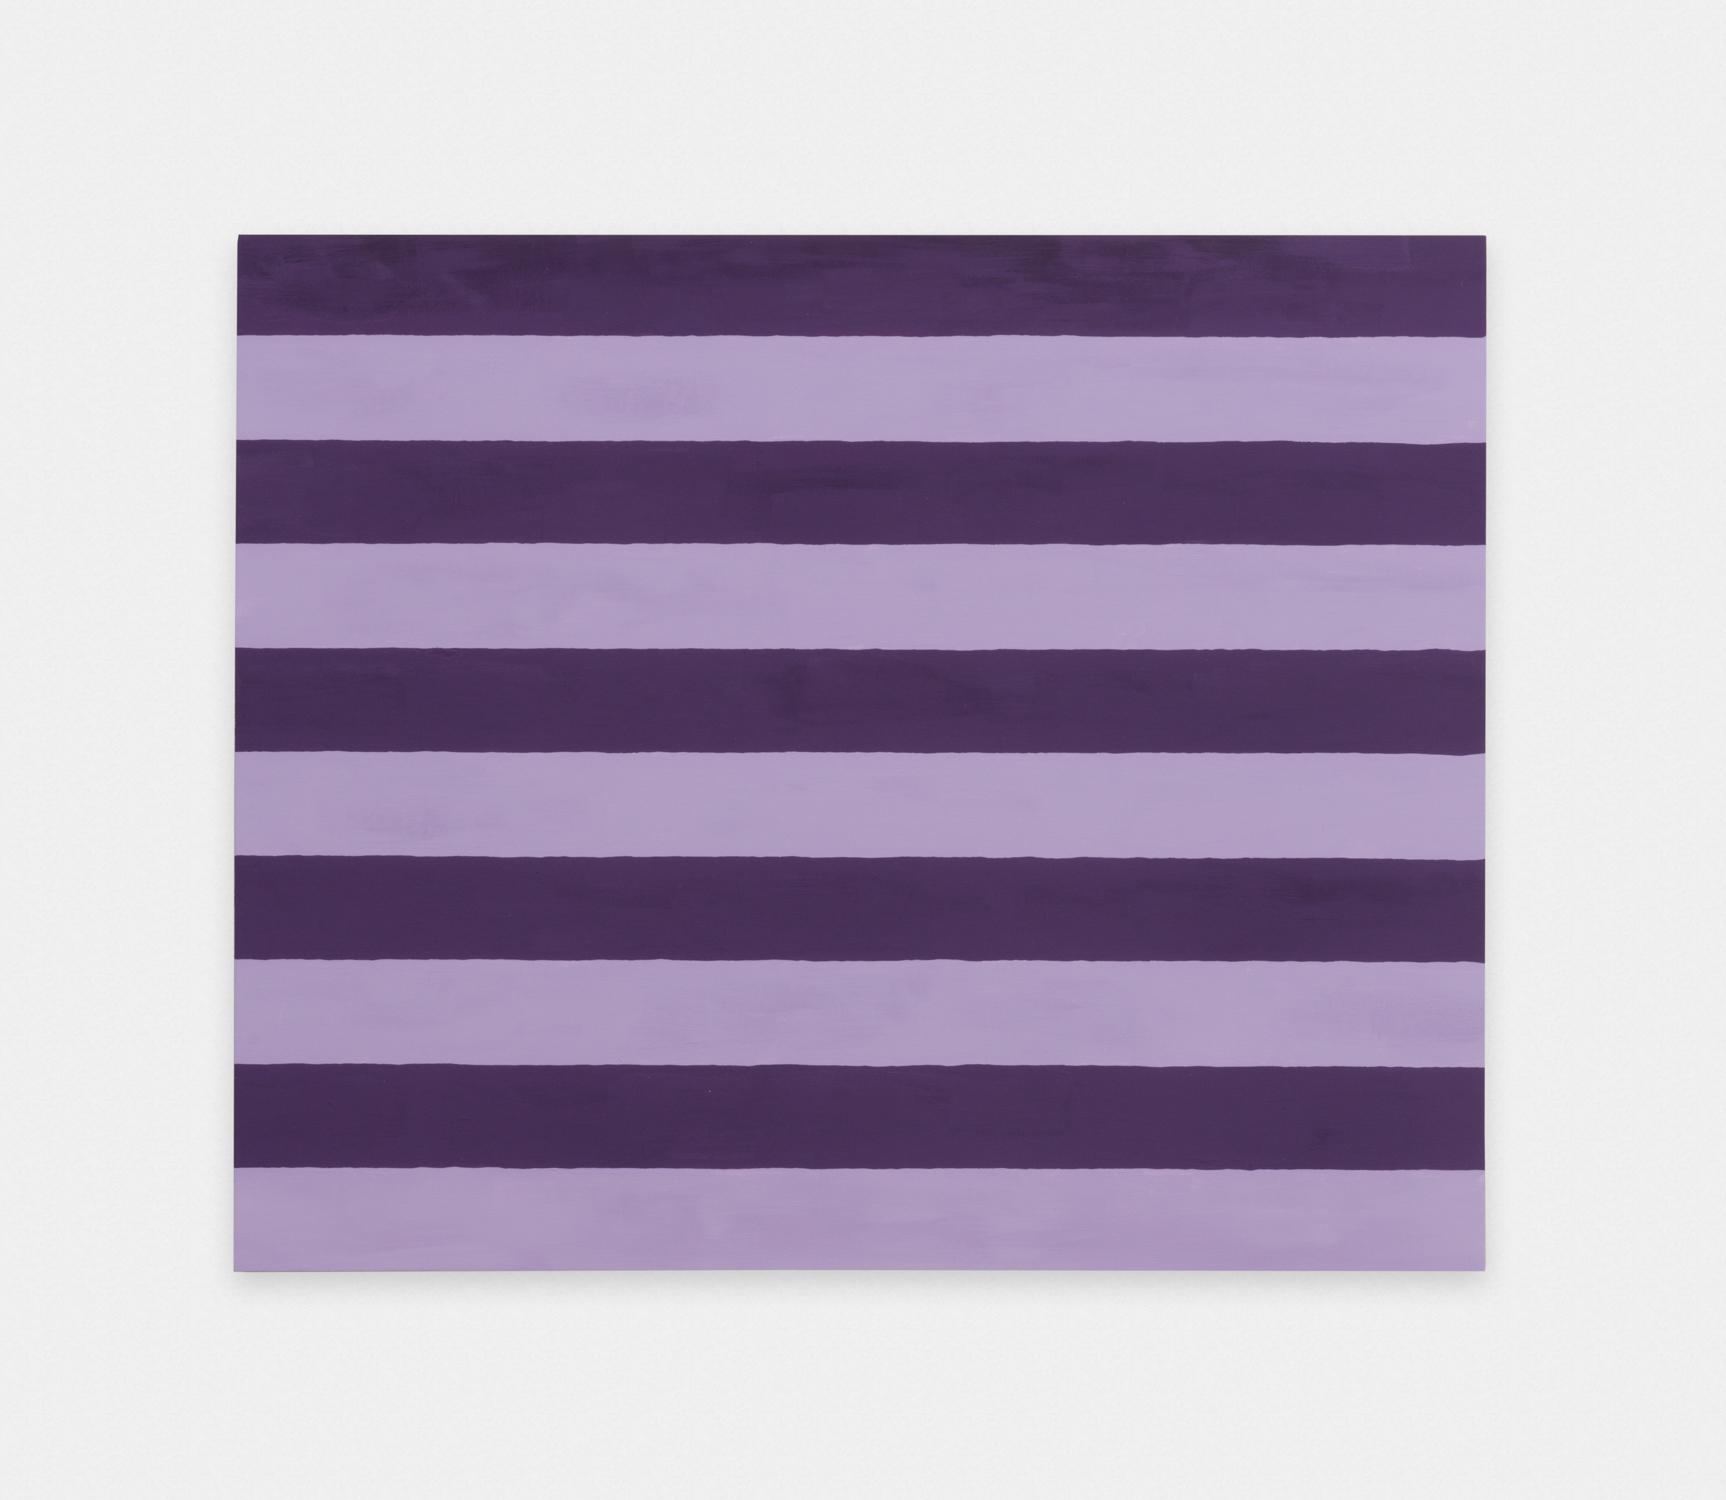 Matt Morris  Sleeping Sherrie (Two Inch Stripes #7)  2016 Casein on mahogany 20h x 24w in MMor003